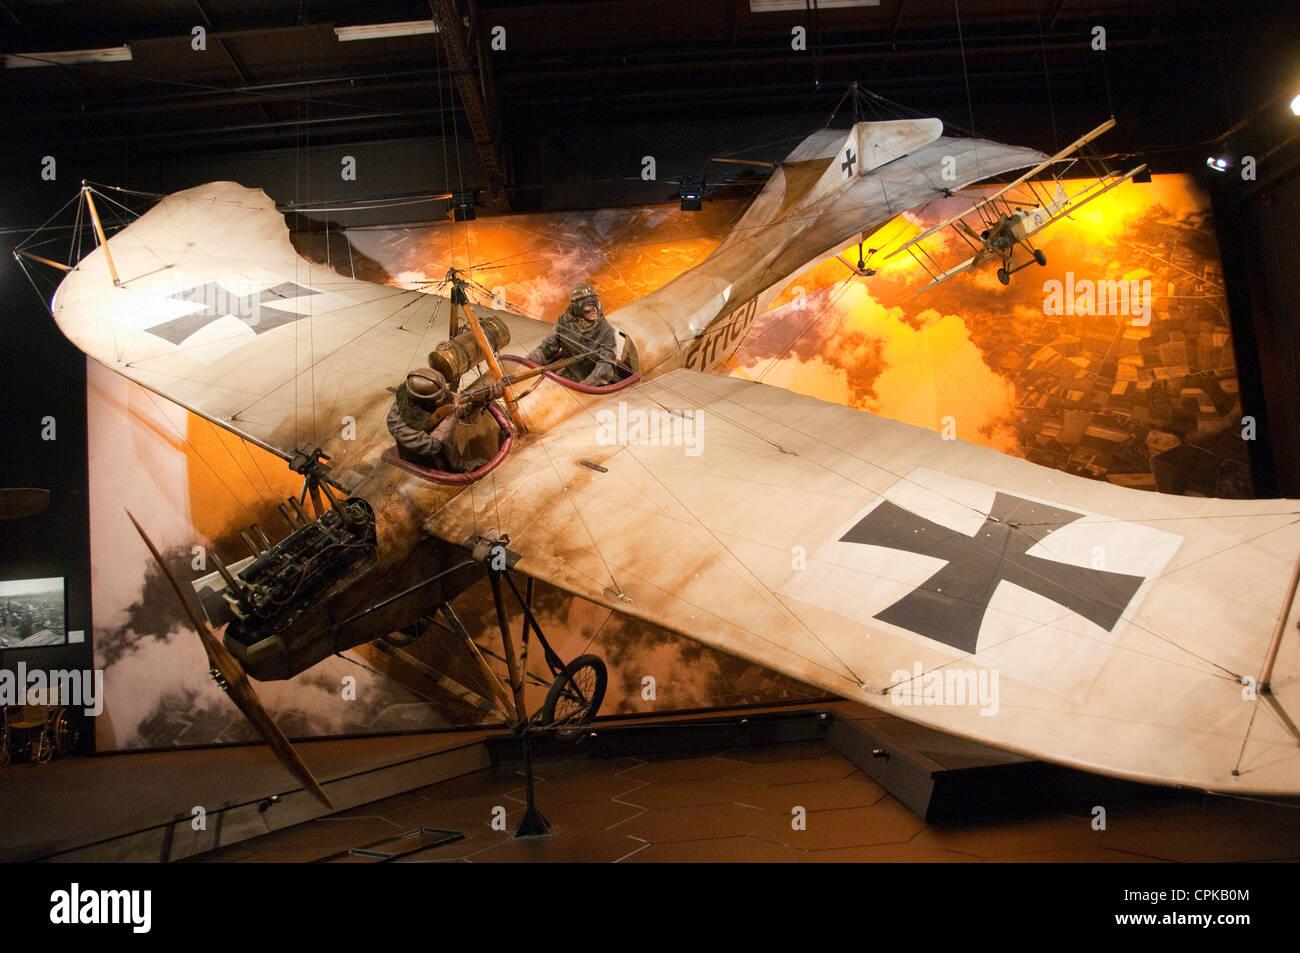 New Zealand Marlborough, exhibits at Omaka Aviation Heritage Centre of WWI aerial combat - Stock Image